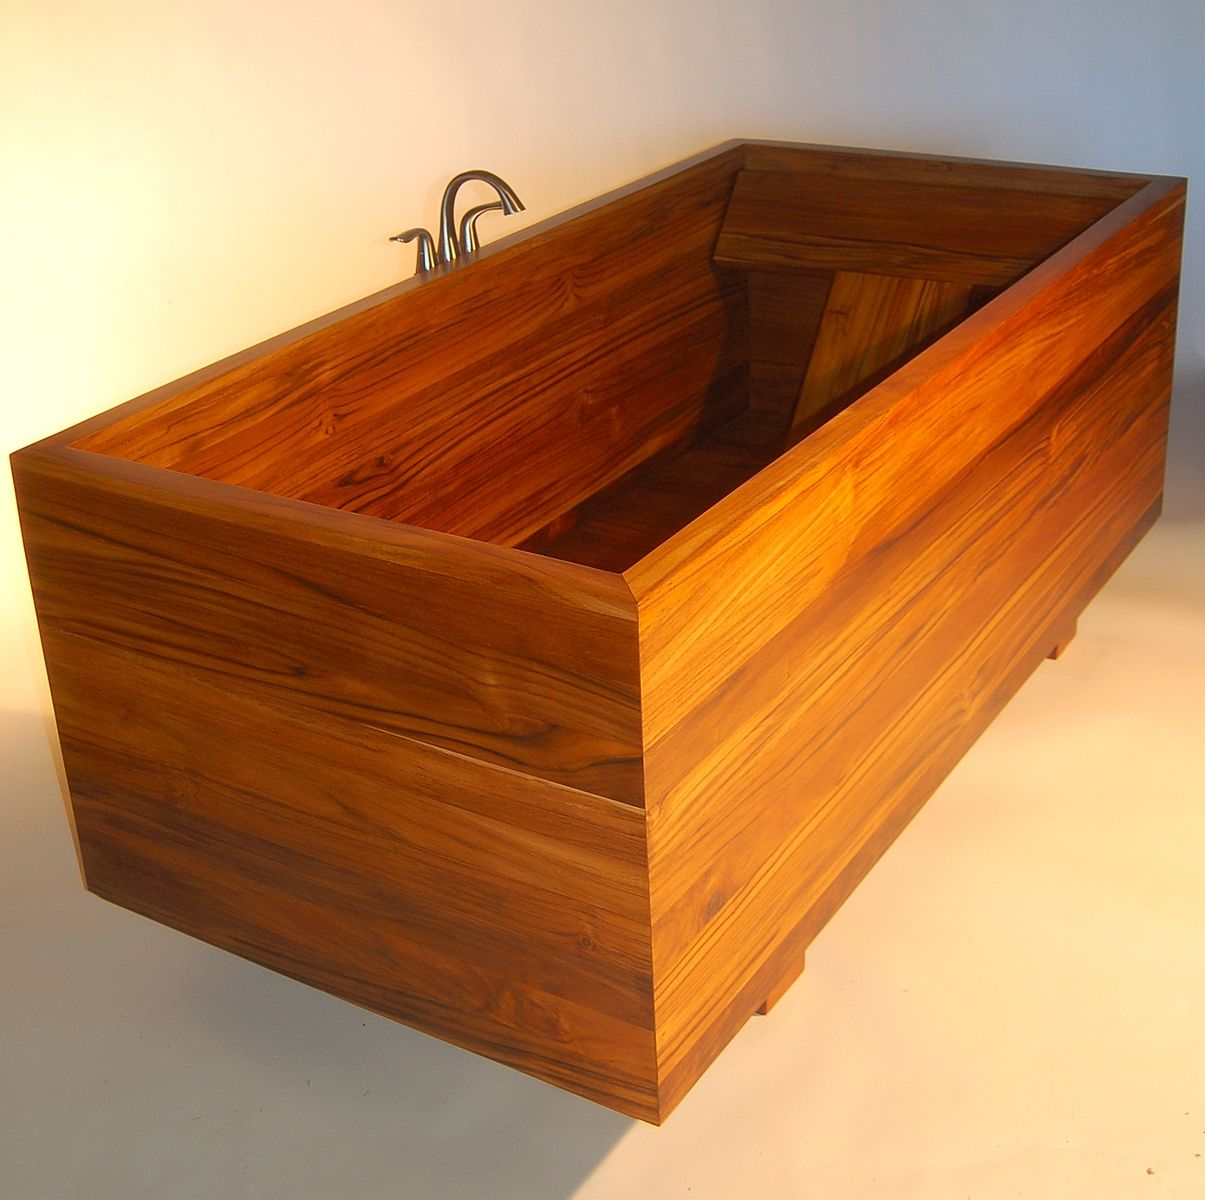 handmade custom japanese ofuro in plantation teak by bath in wood of maine llc. Black Bedroom Furniture Sets. Home Design Ideas